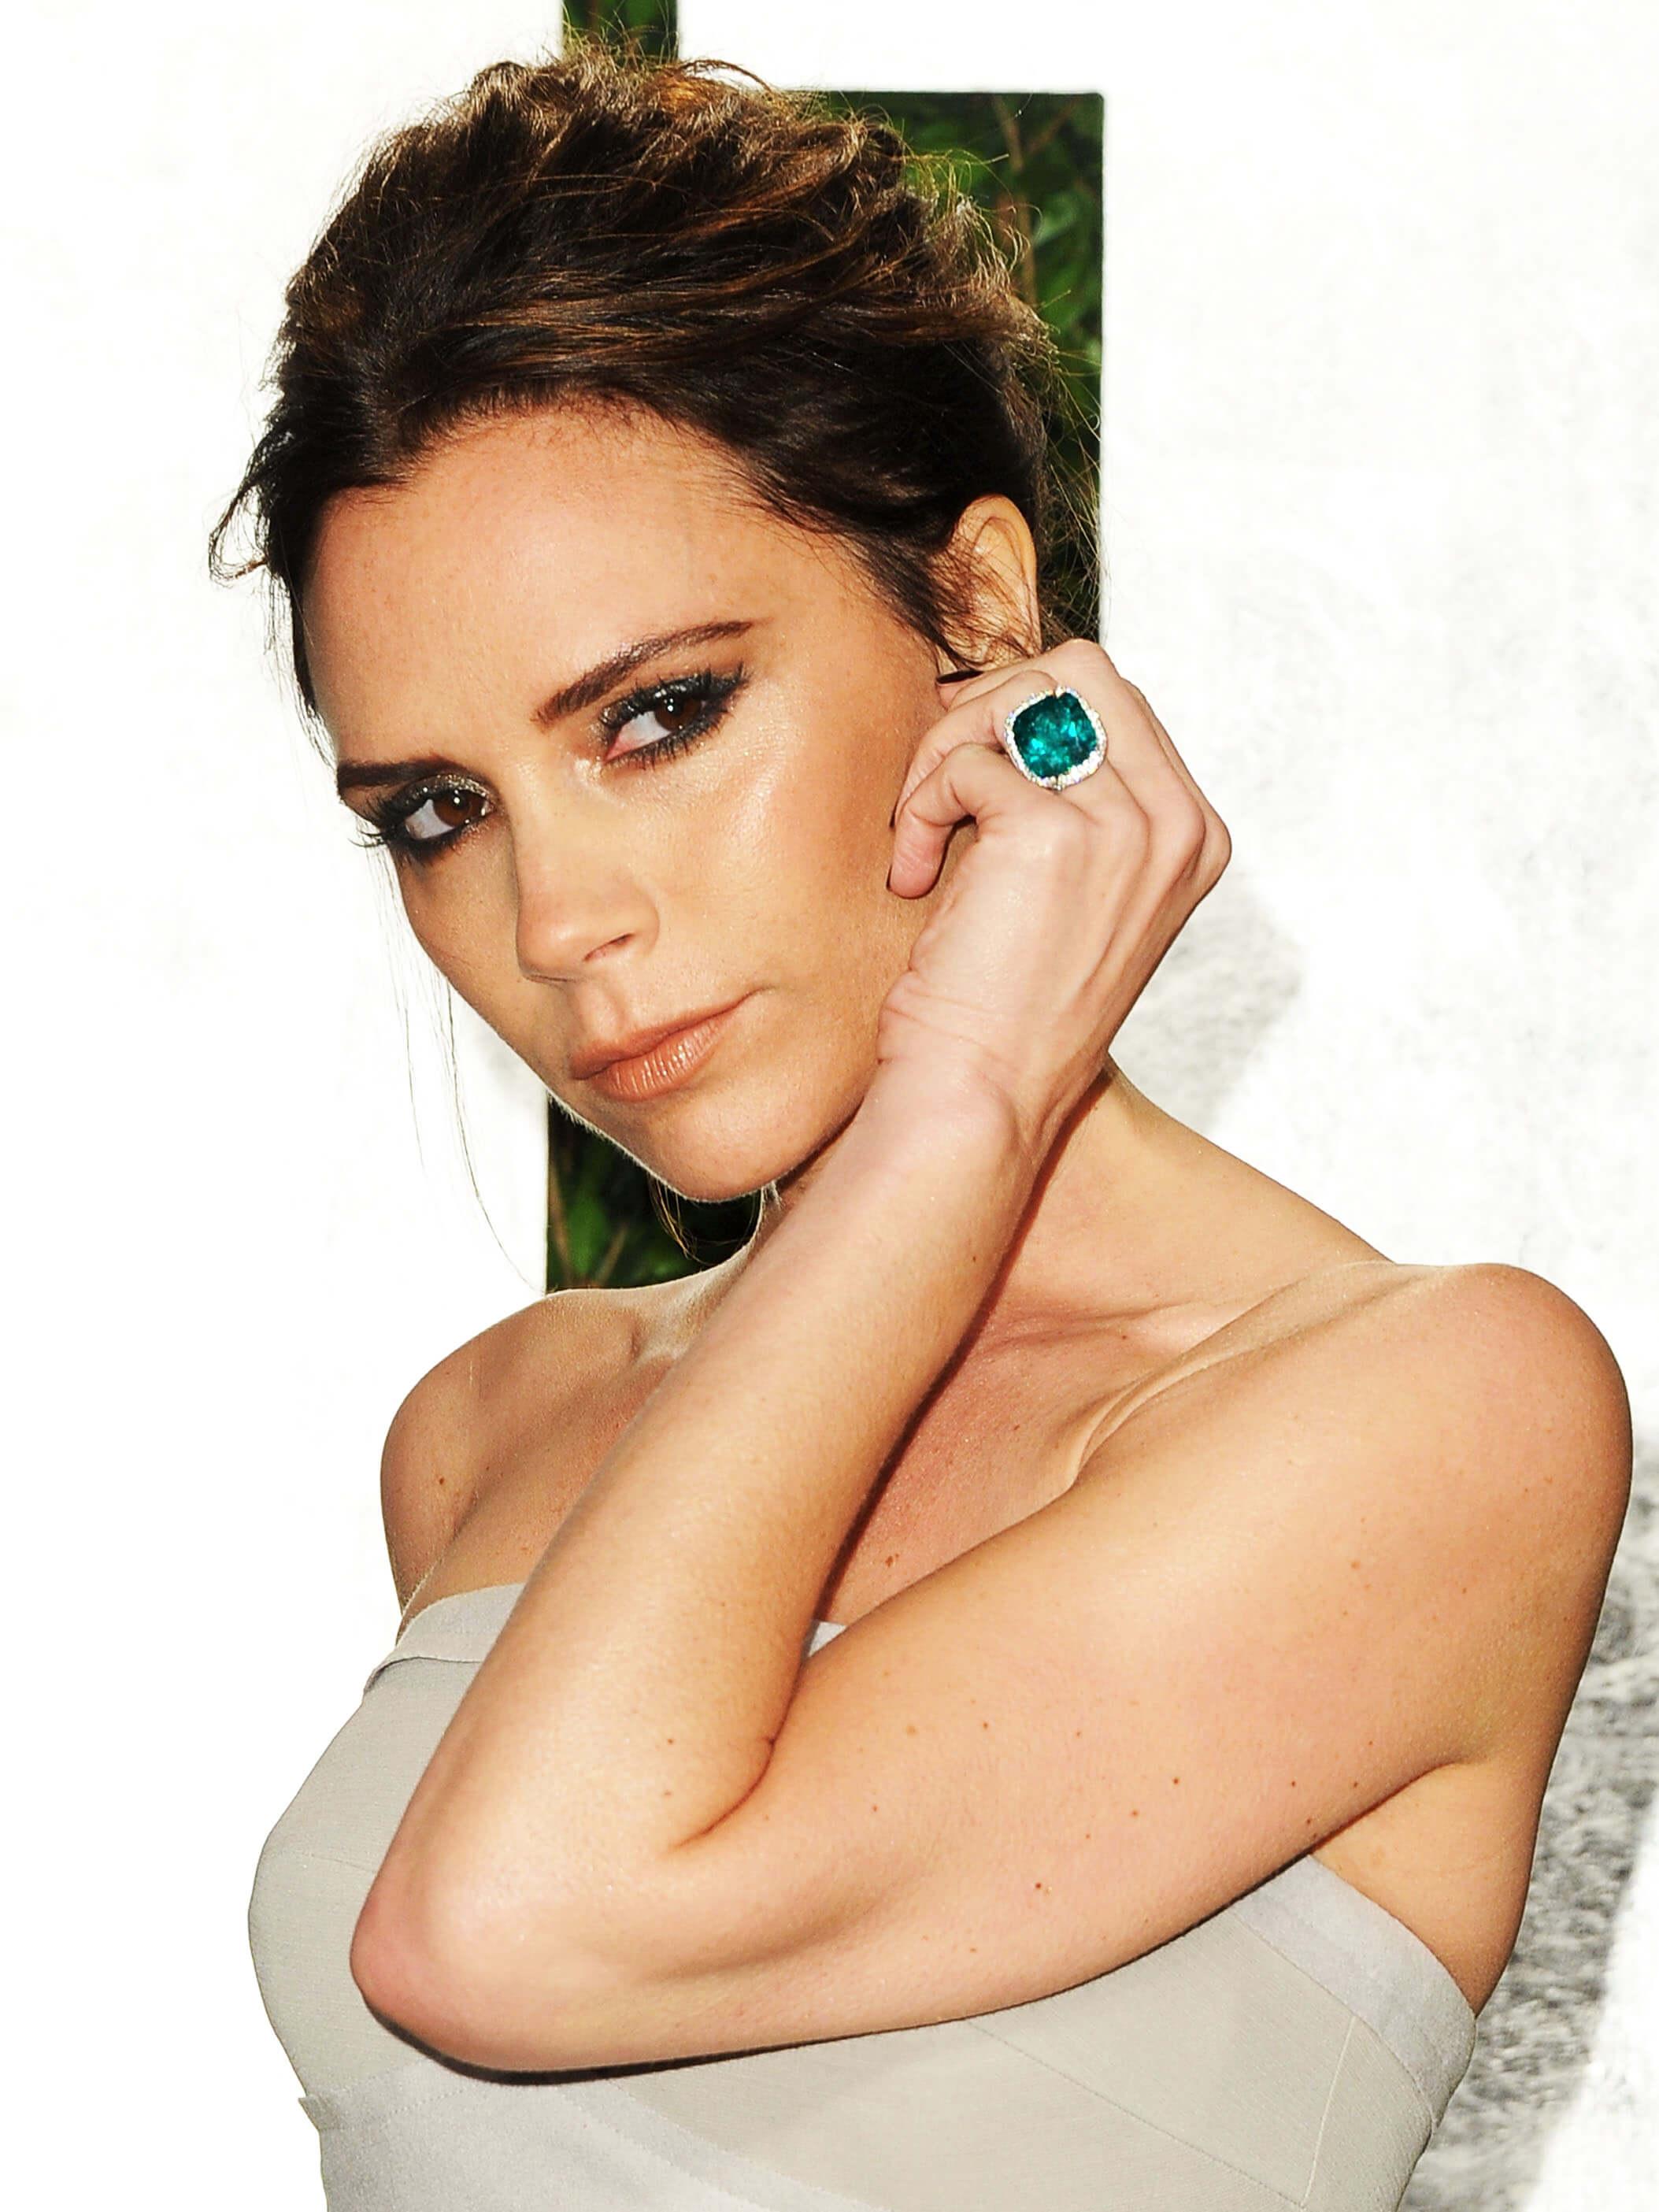 Victoria Beckham wearing her emerald engagement ring